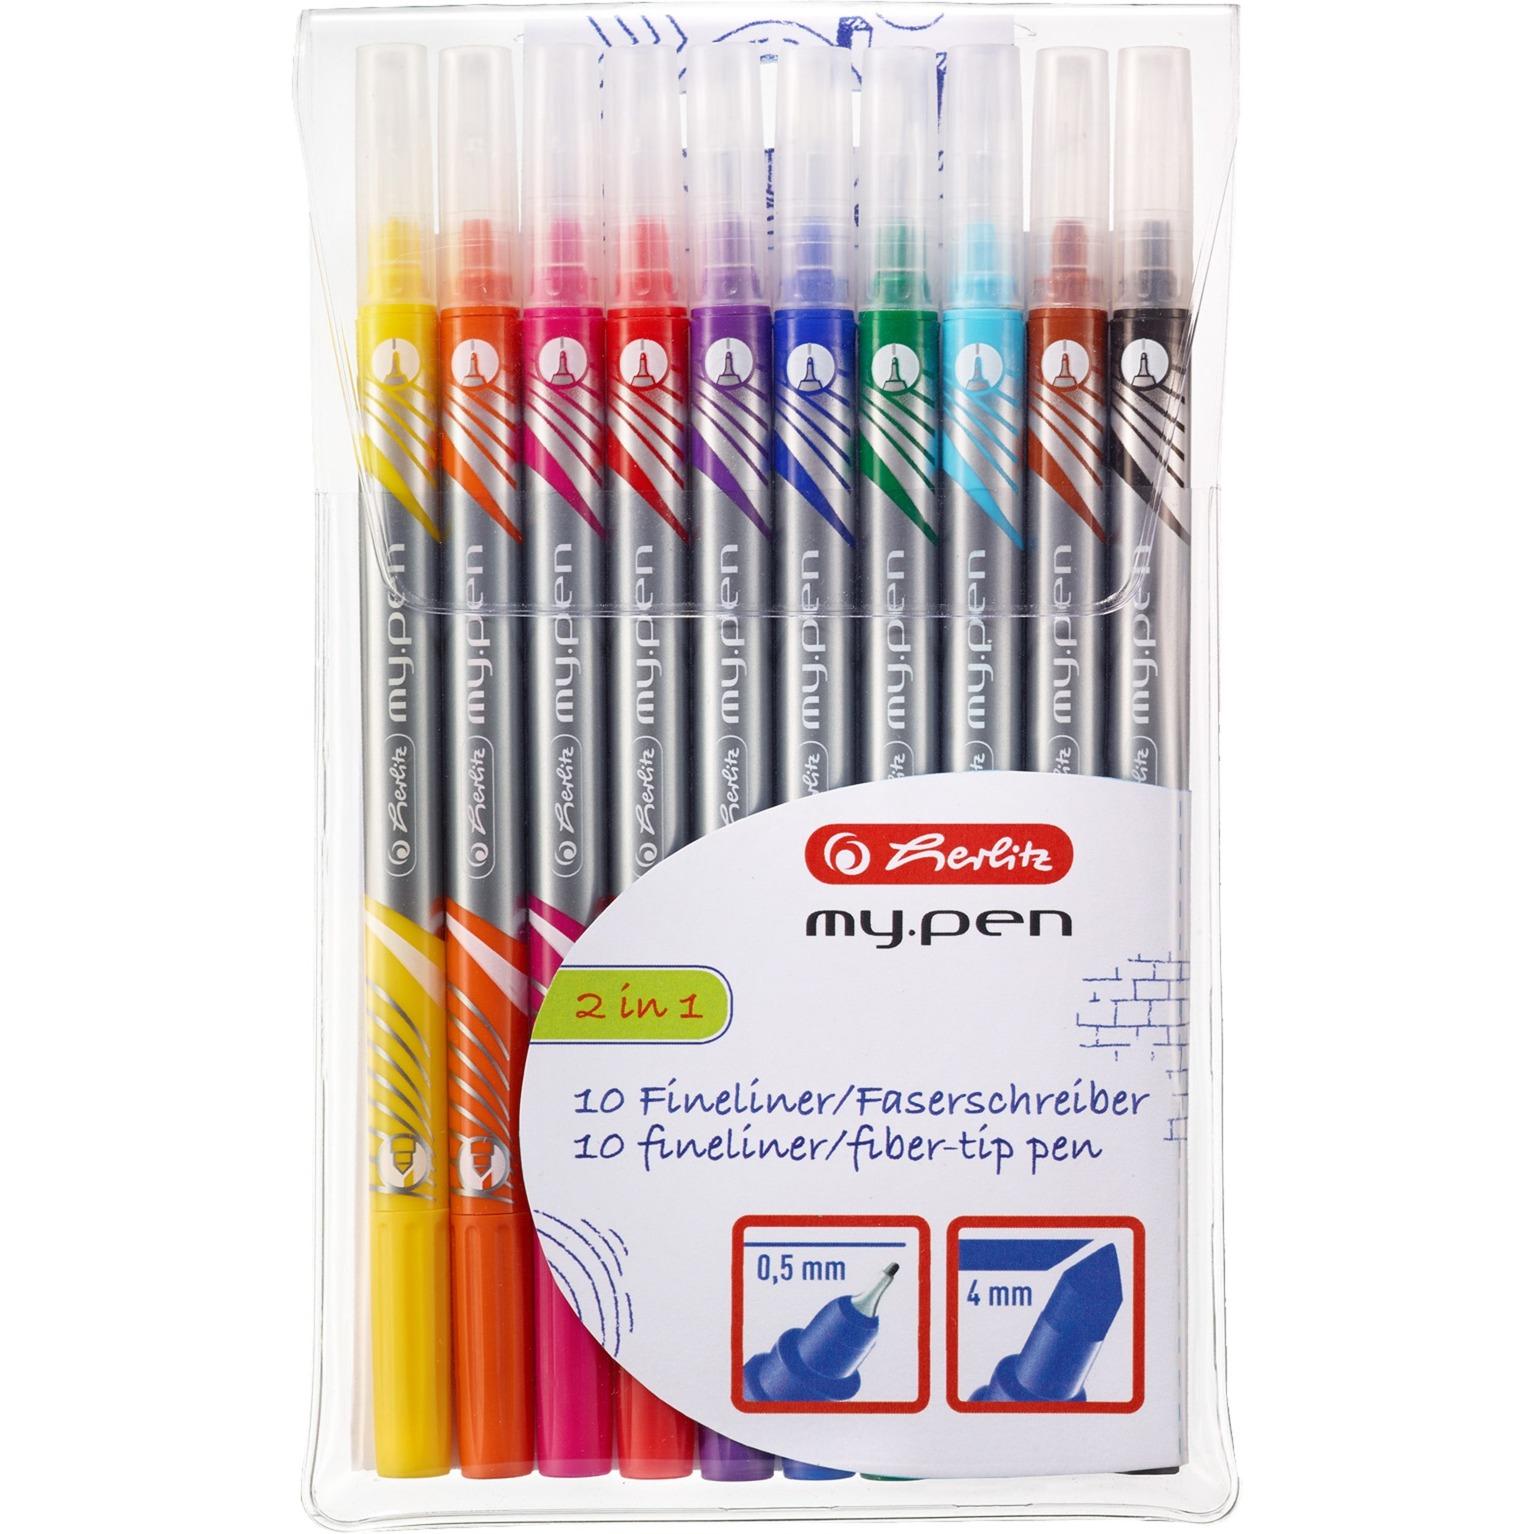 11367232 marcador 10 pieza(s) Negro, Azul, Marrón, Verde, Naranja, Rosa, Púrpura, Rojo, Amarillo Punta fina, Lápiz